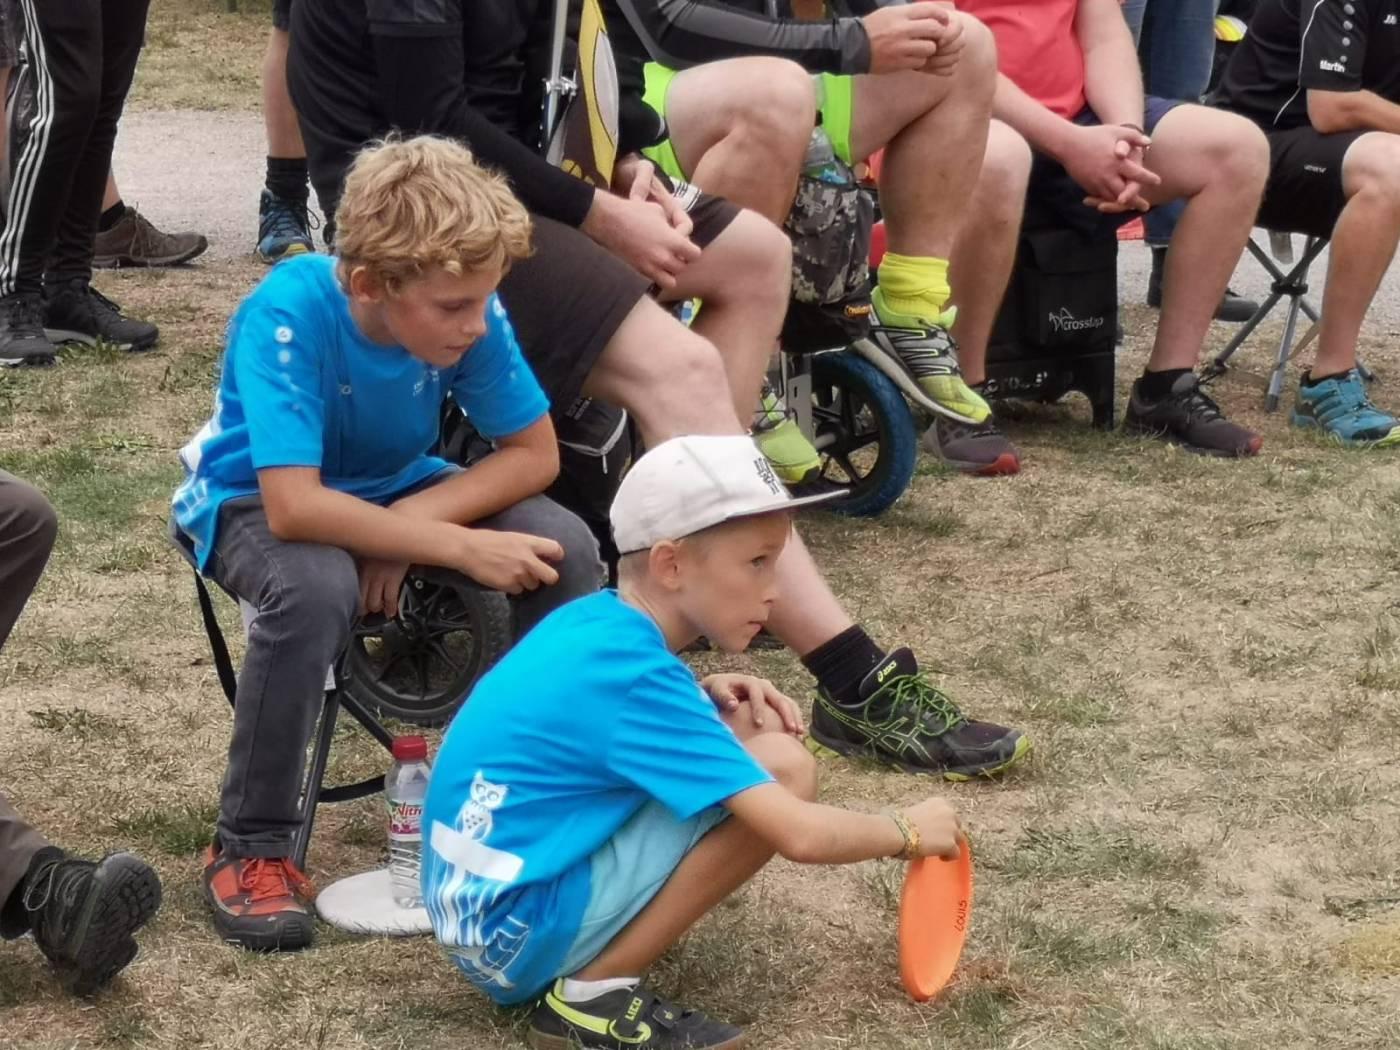 2018-09-02_NDS Landesmeisterschaft Discgolf Hannover 2018_035